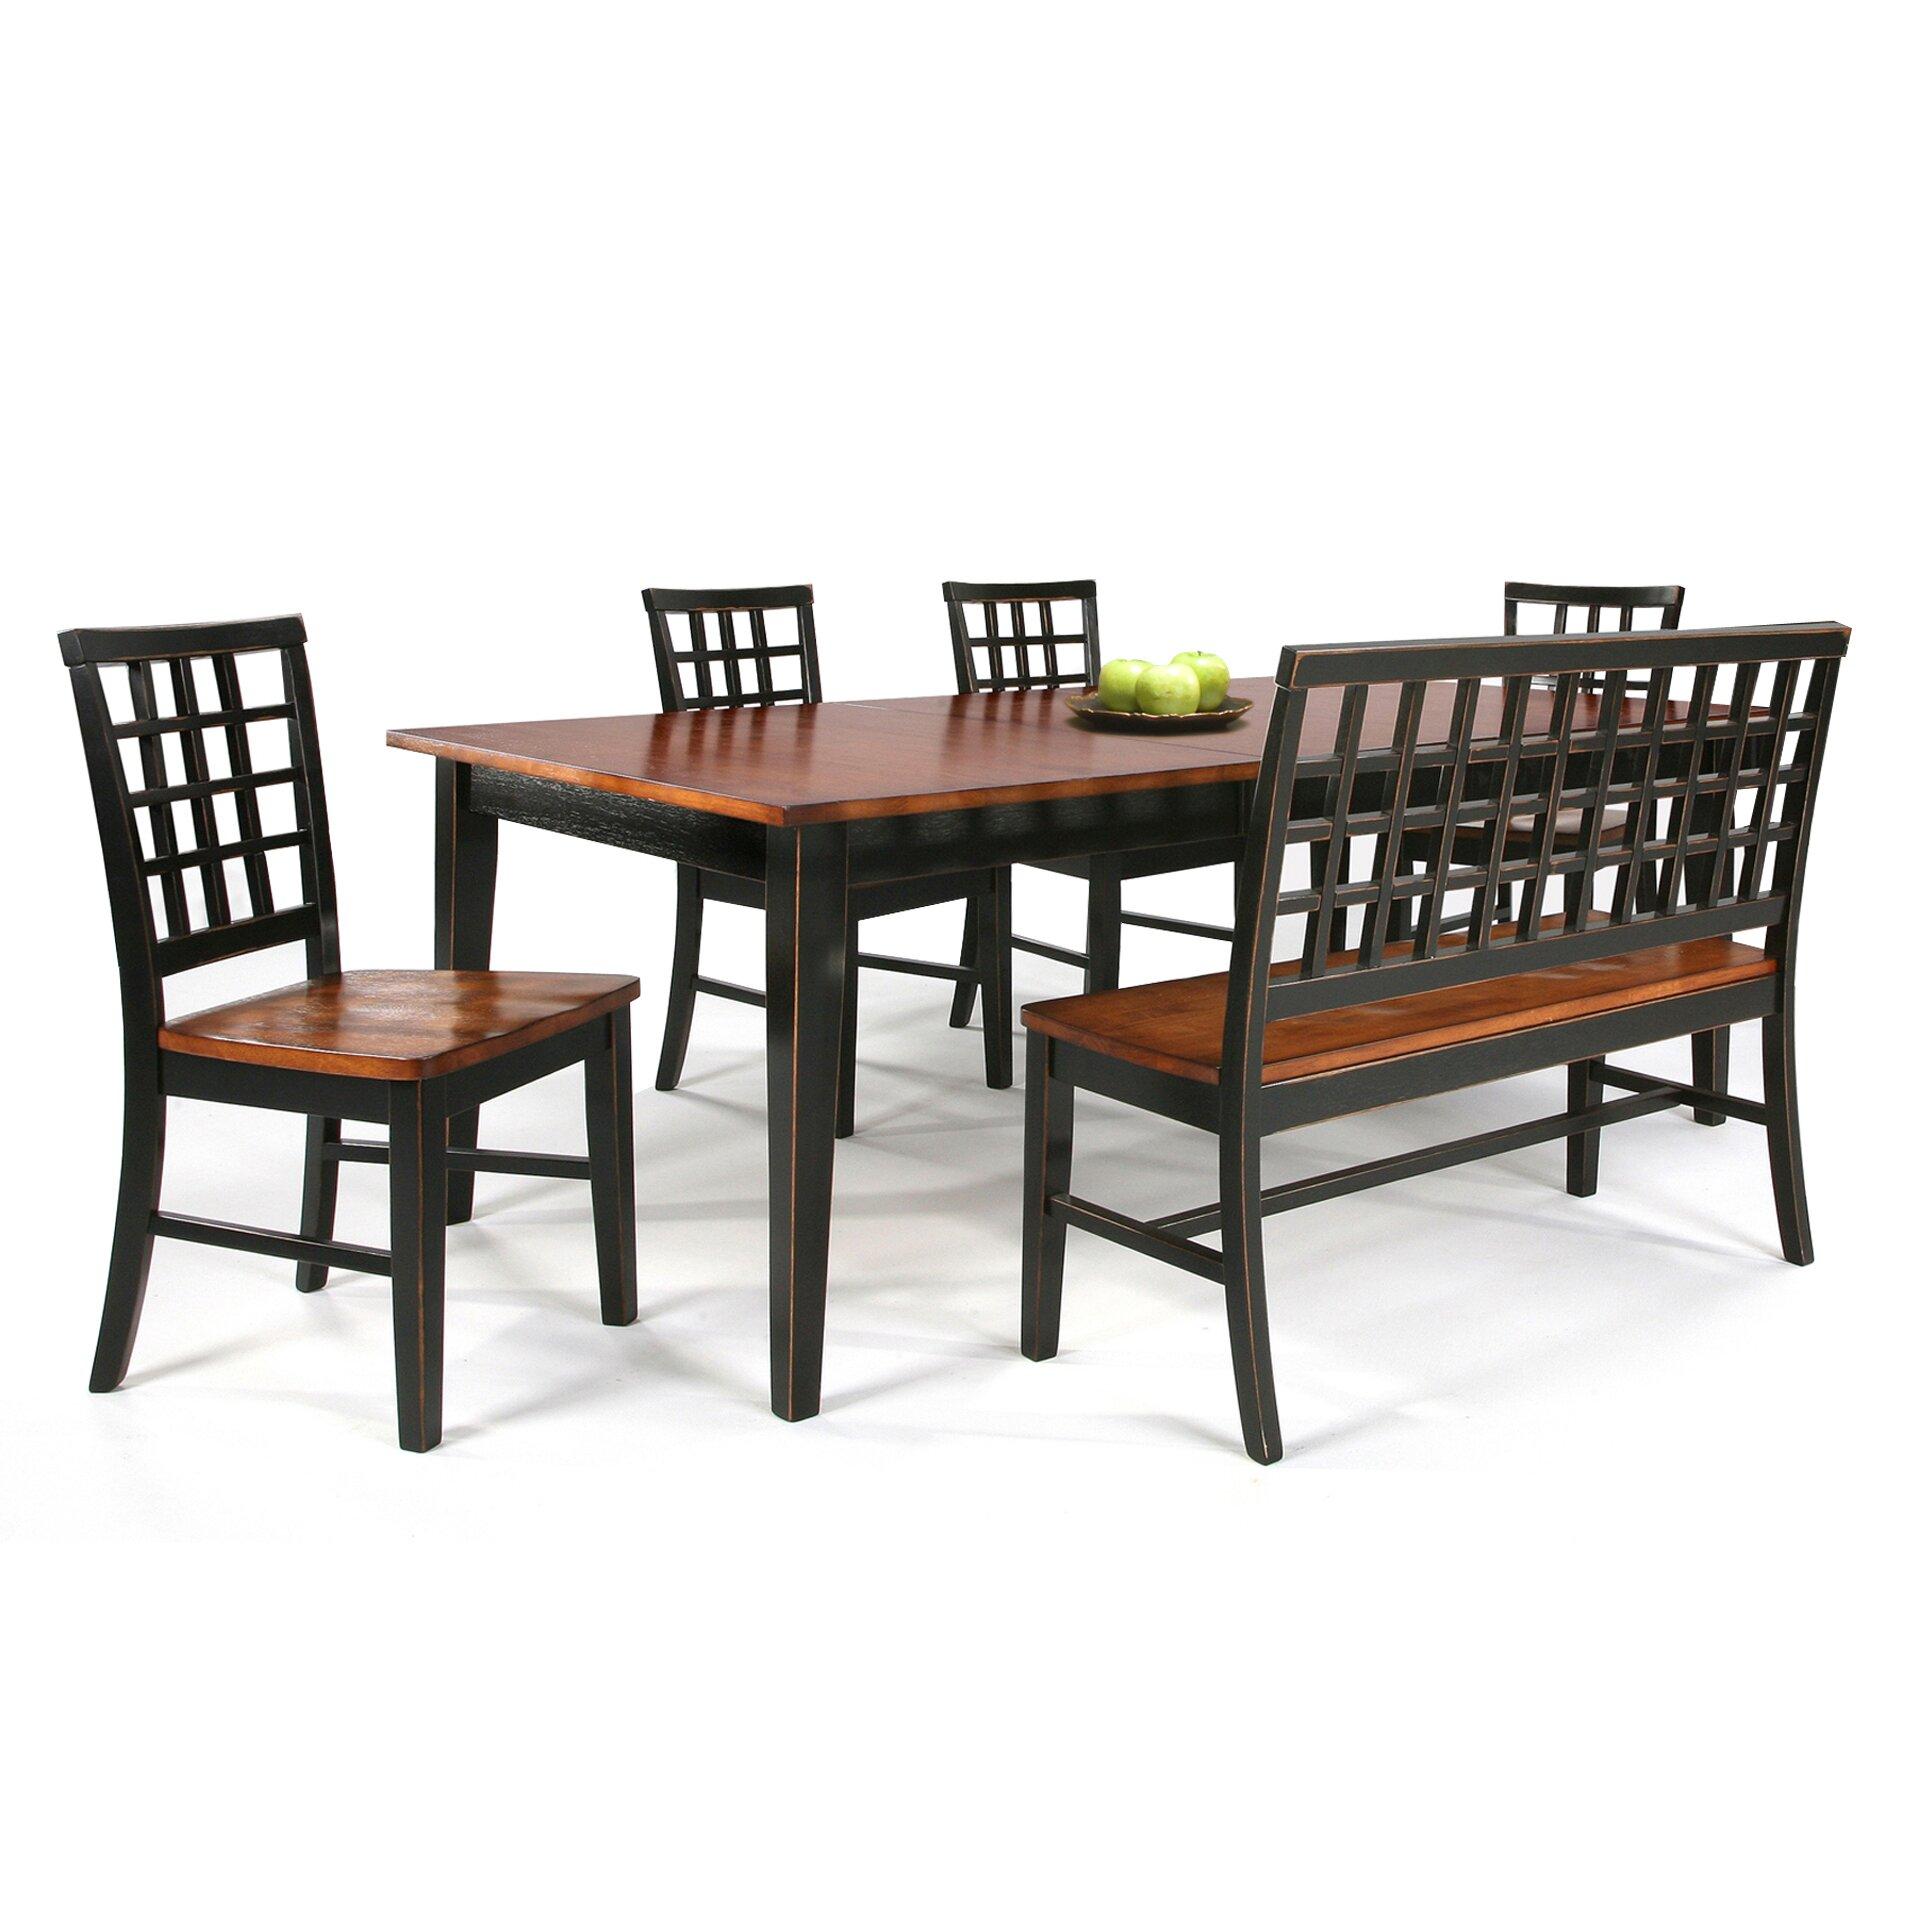 imagio home arlington lattice back side chair reviews wayfair. Black Bedroom Furniture Sets. Home Design Ideas